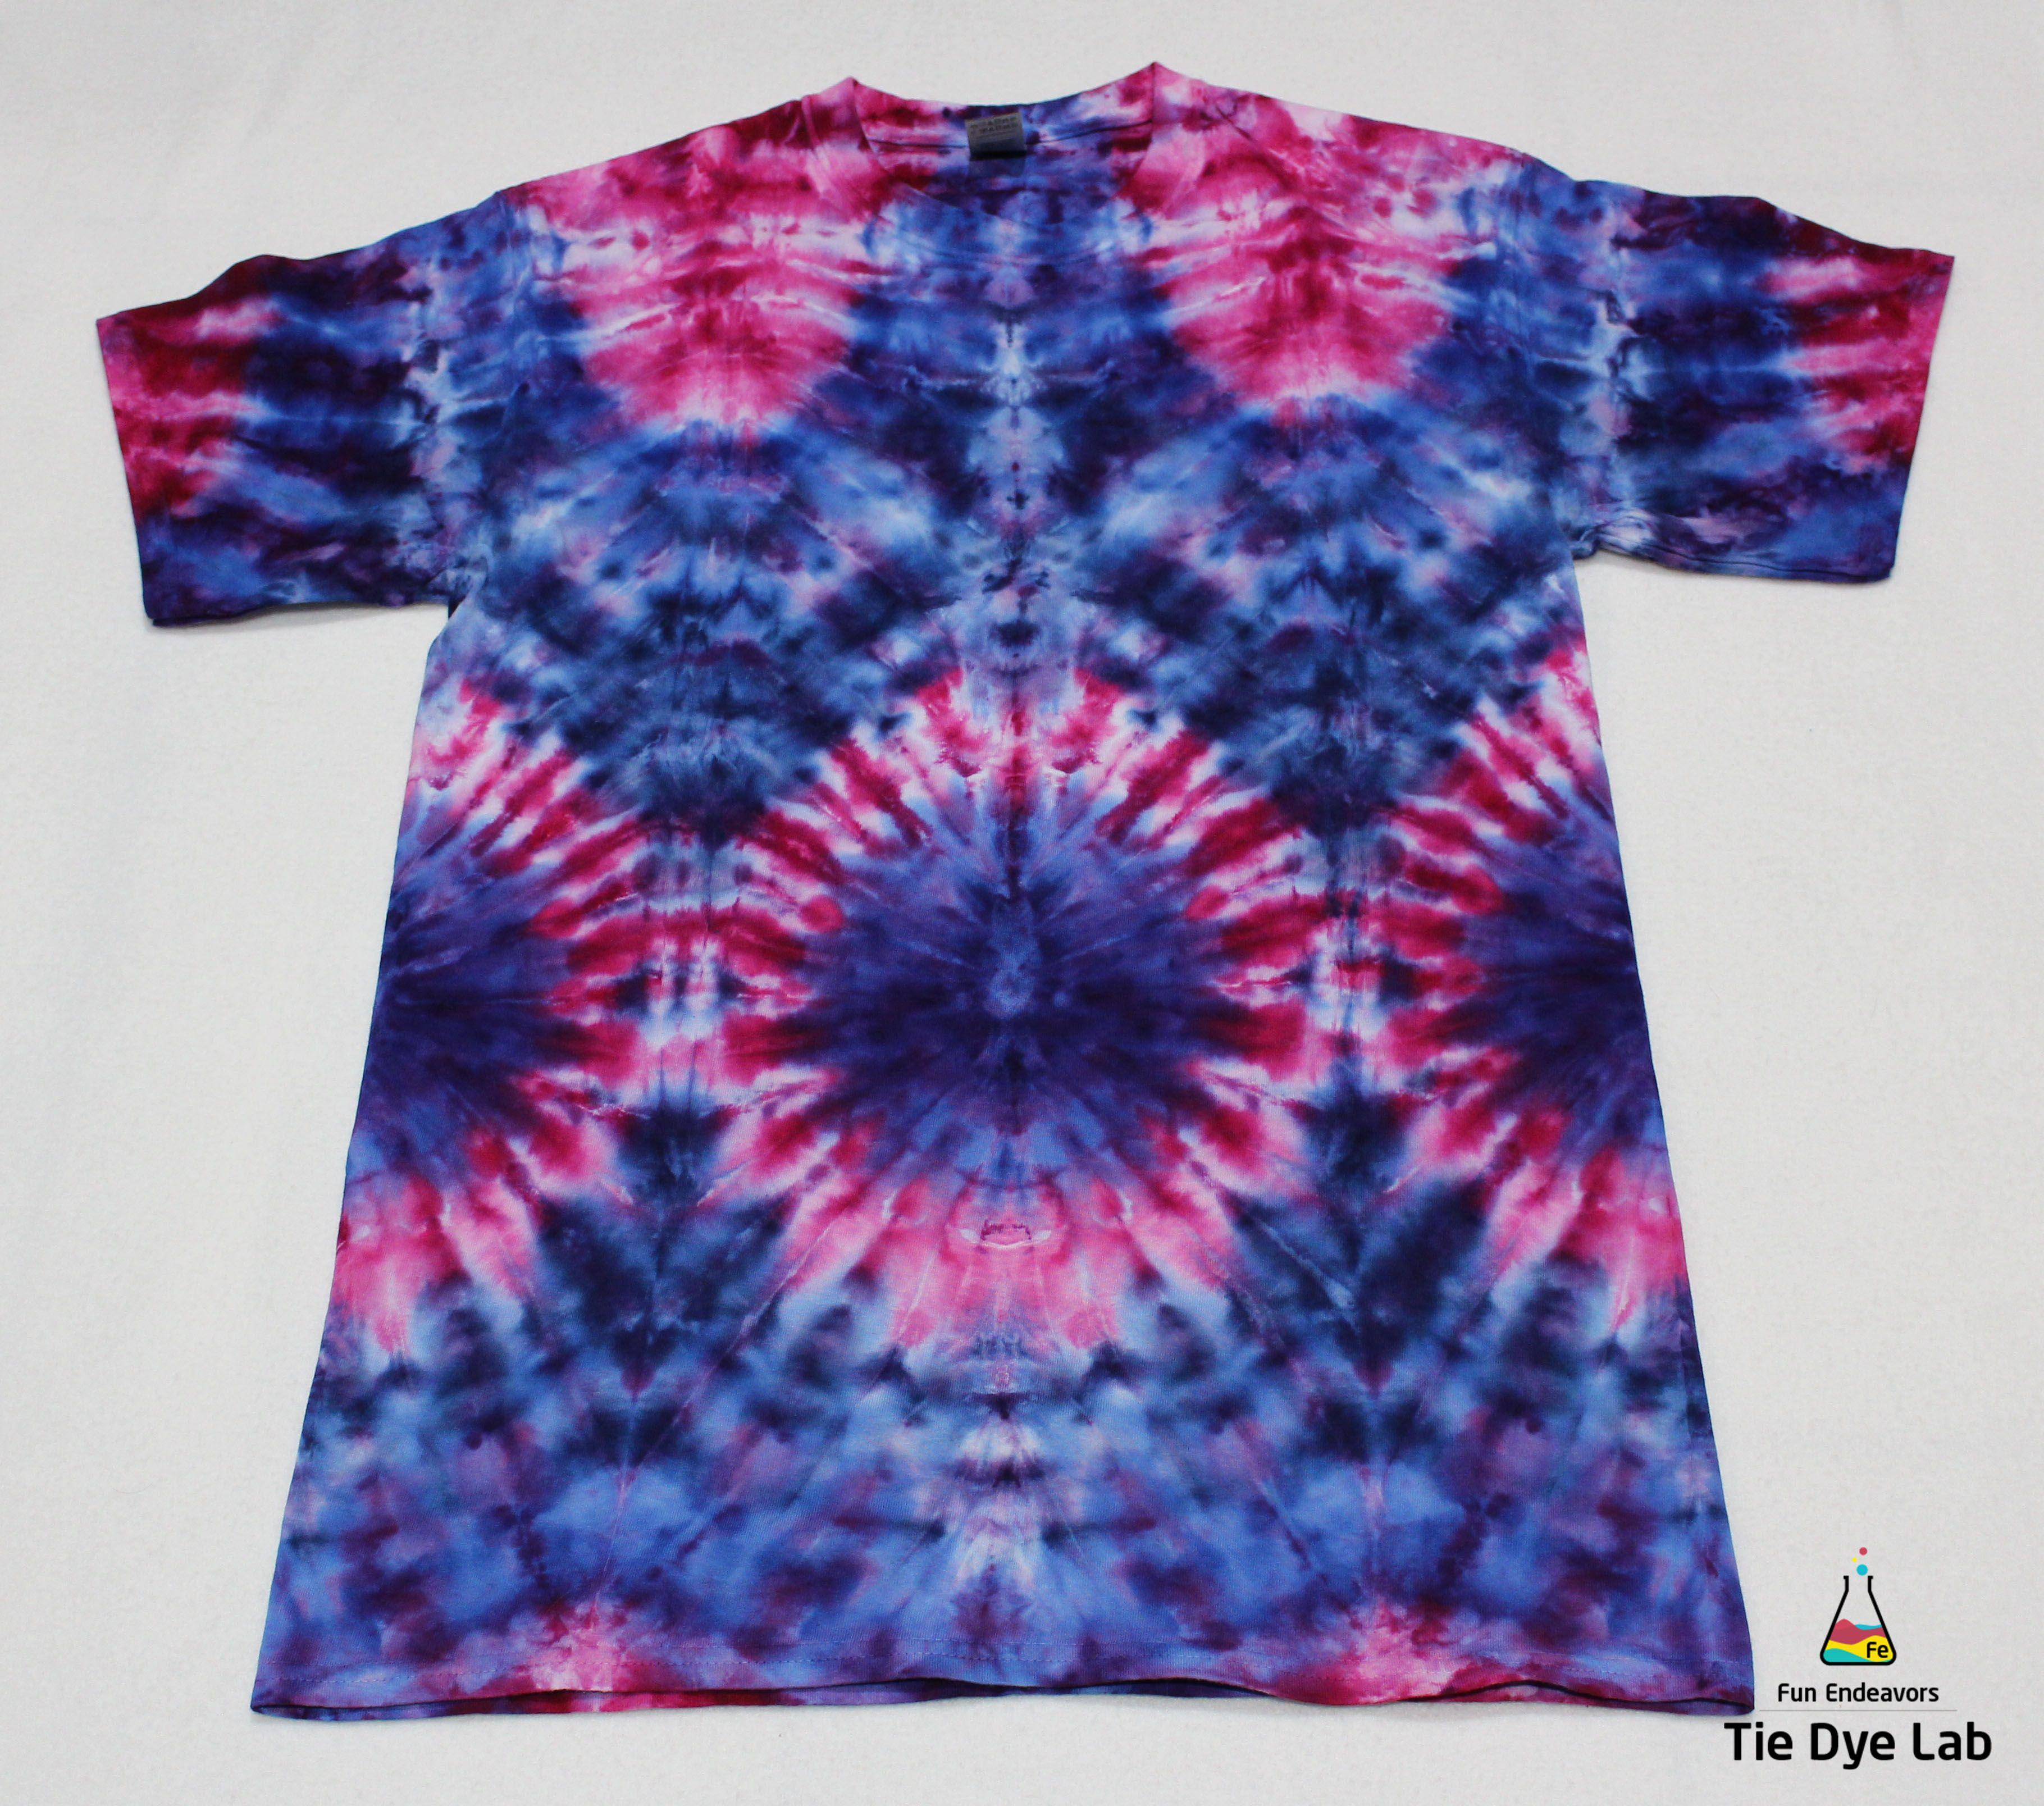 Ice Dye Tie Dye Tutorial Tie Dye Tutorial Tie Dye Ice Dyeing [ 3216 x 3640 Pixel ]